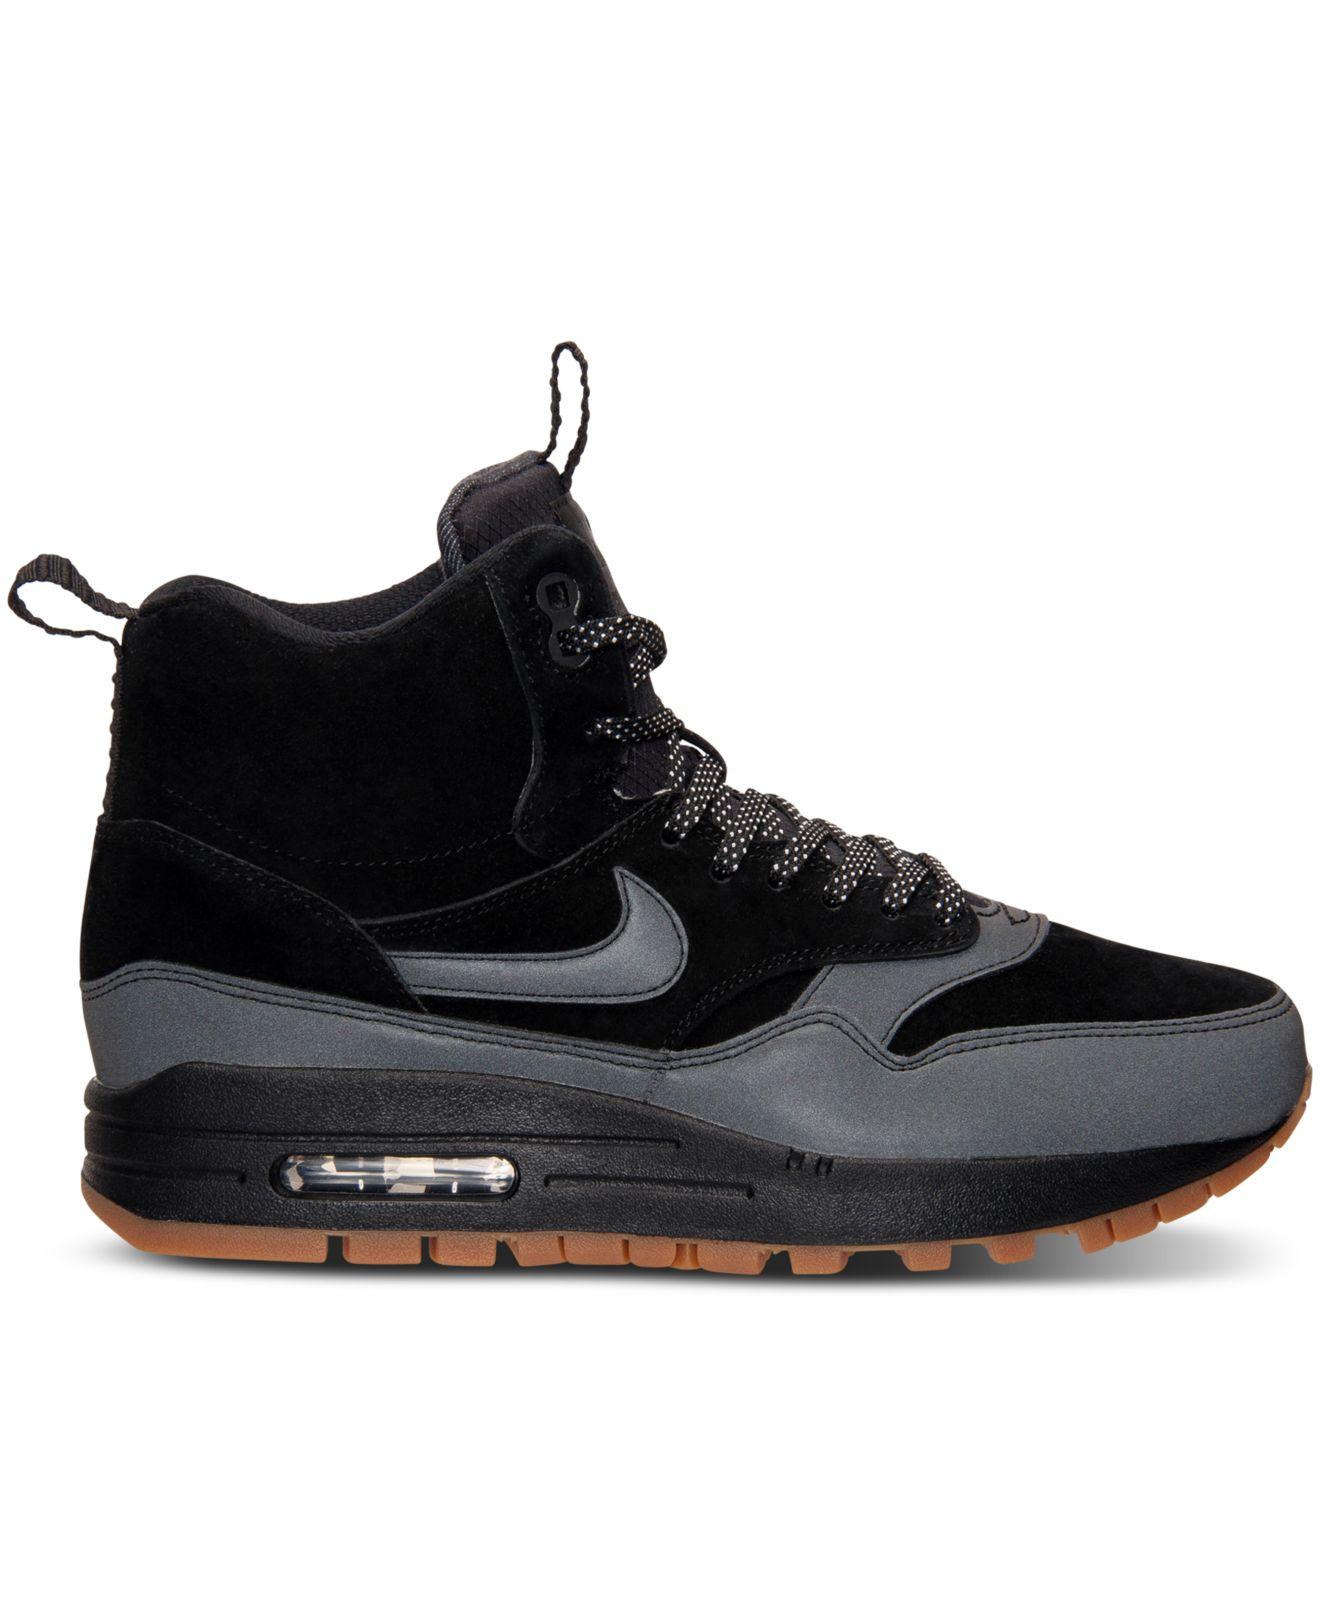 Nike Wmns Air Max 1 Mi Botte Chaussure Noir  / Gomme Dunk